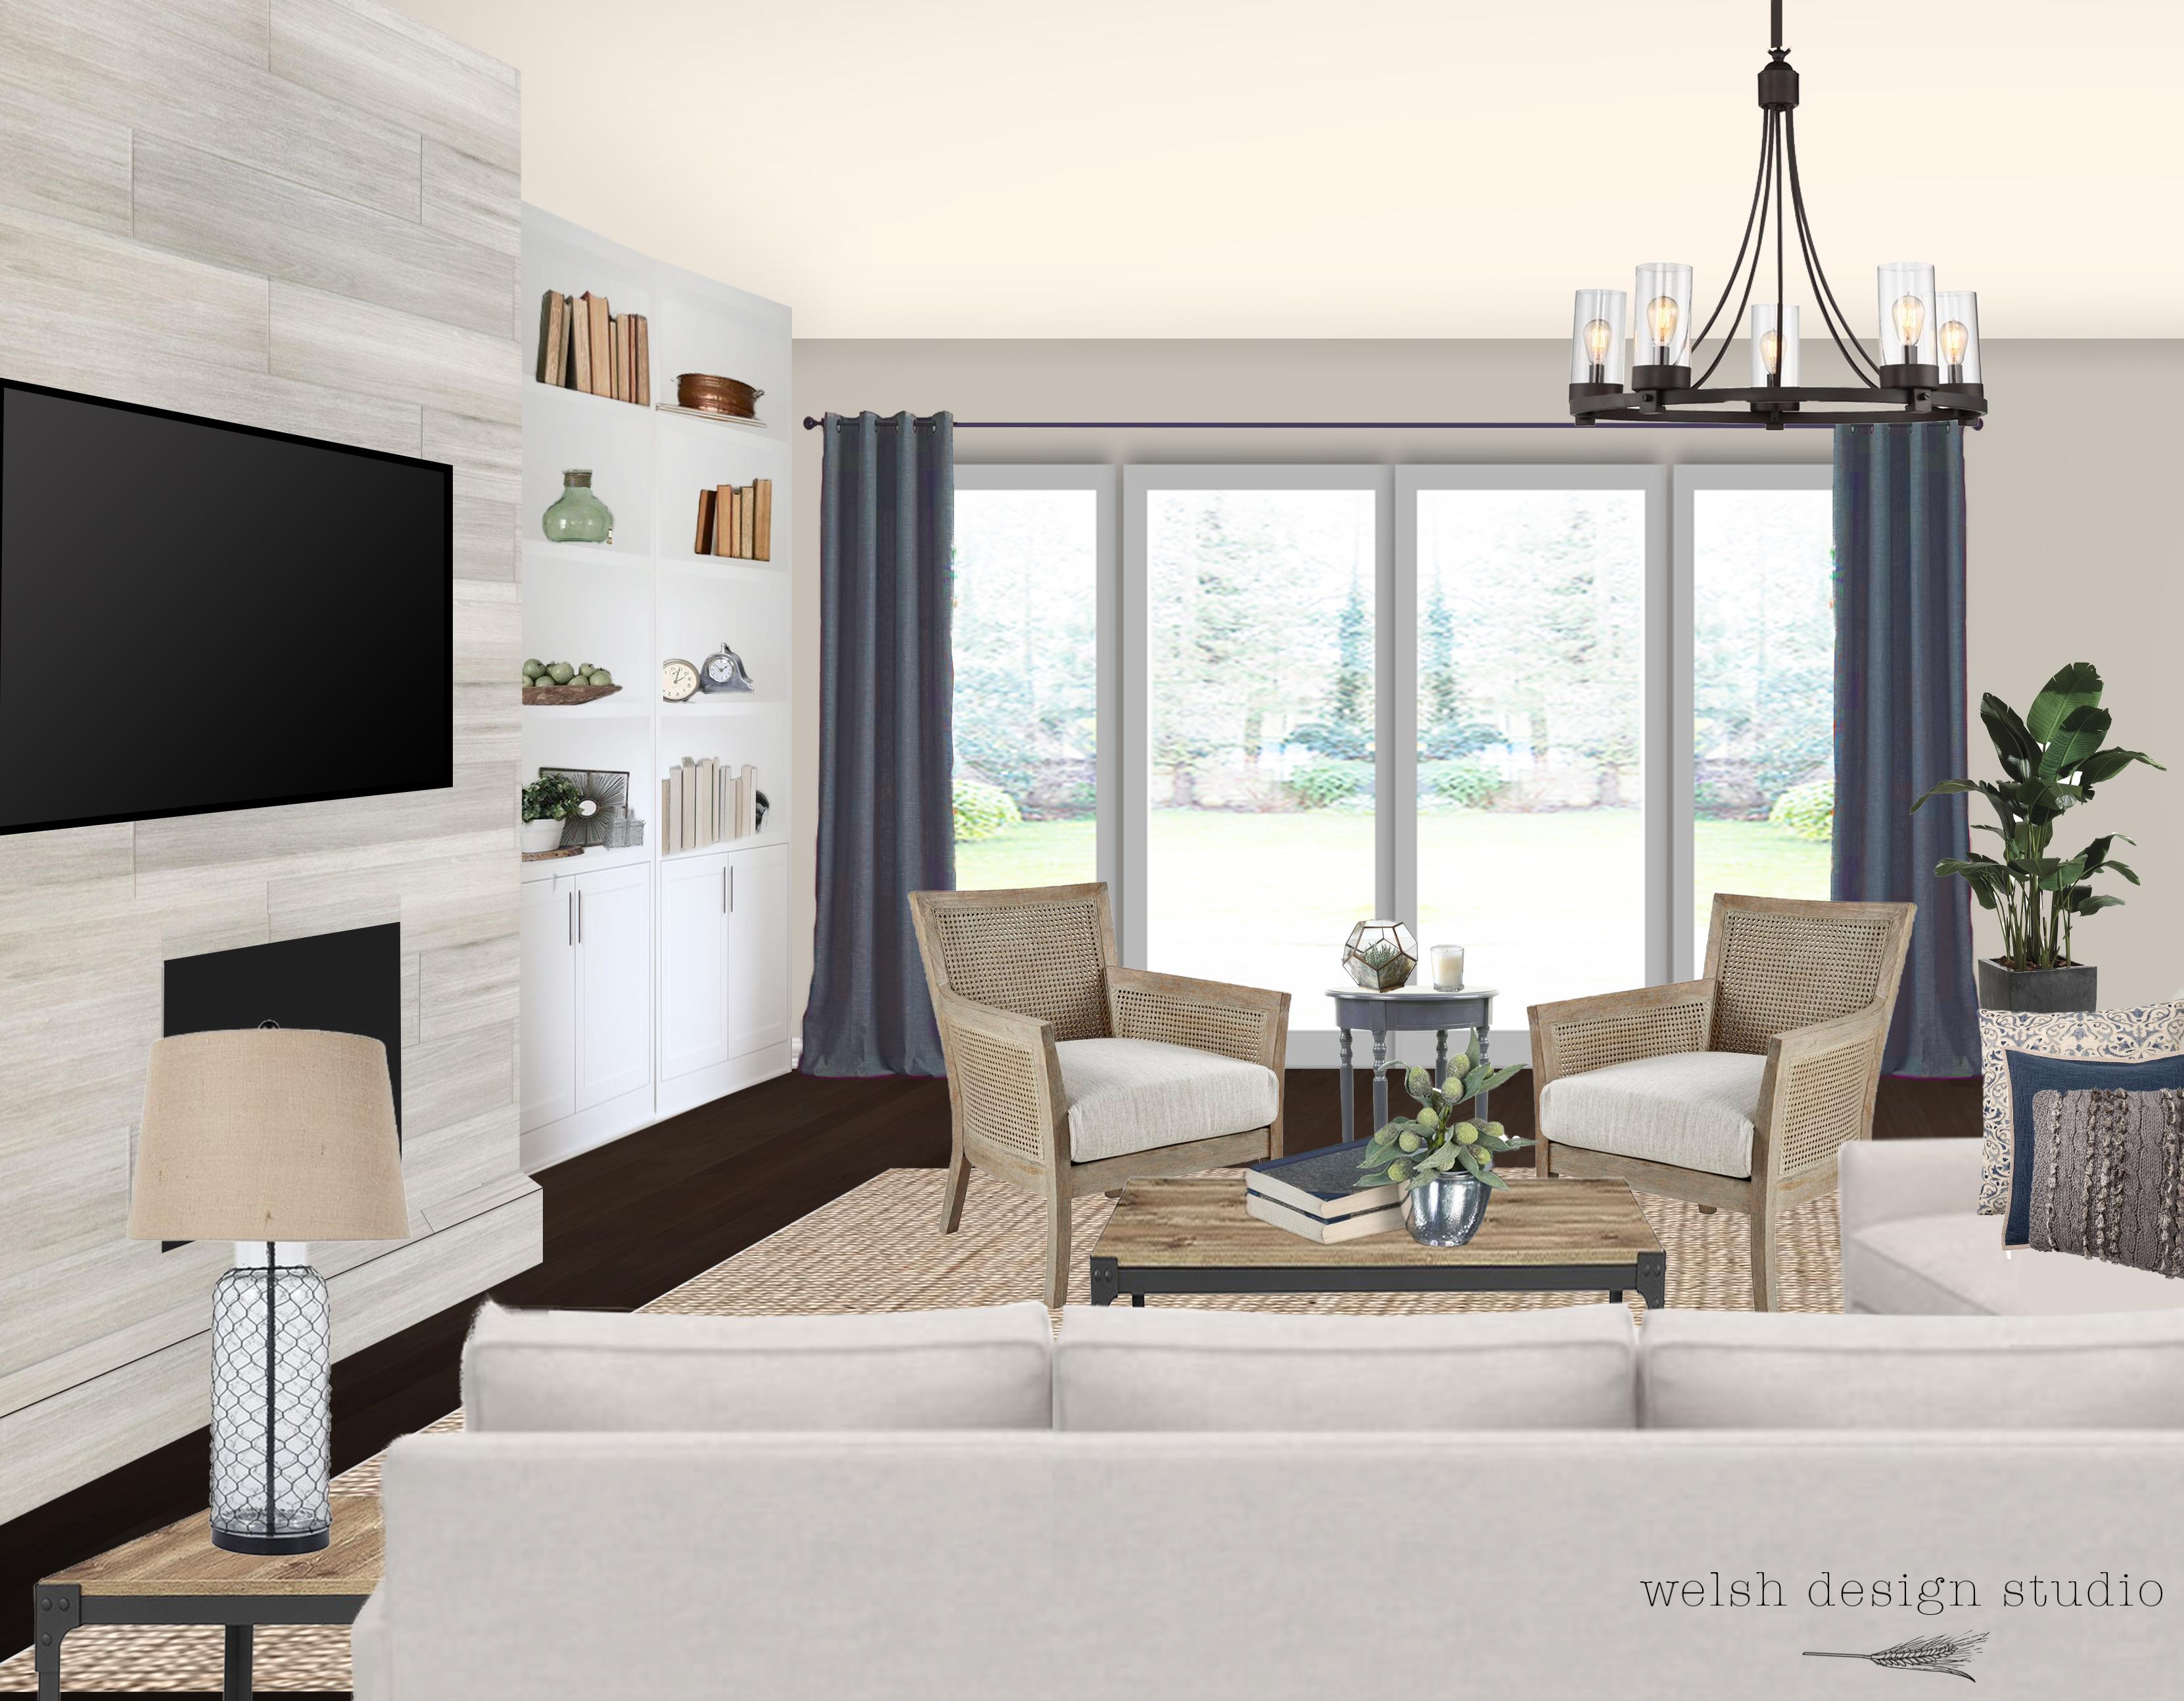 virtual-design-living-room-7-view7 – Welsh Design Studio